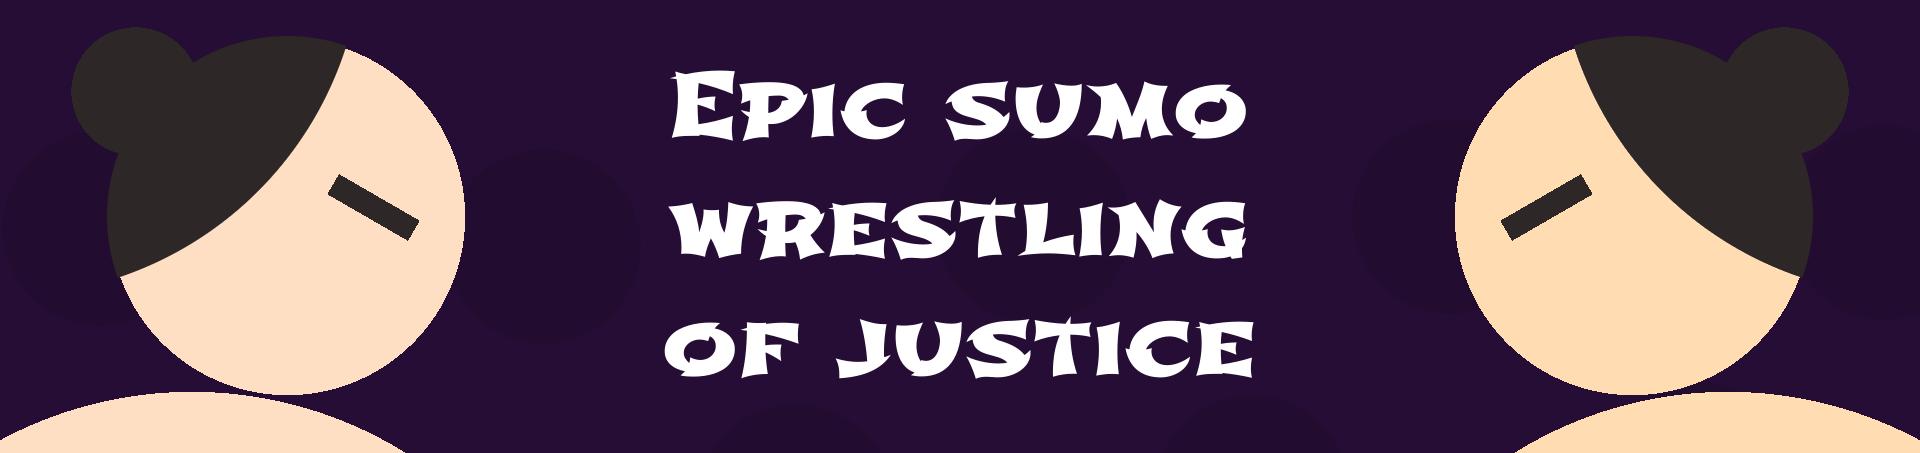 Epic Sumo Wrestling of Justice